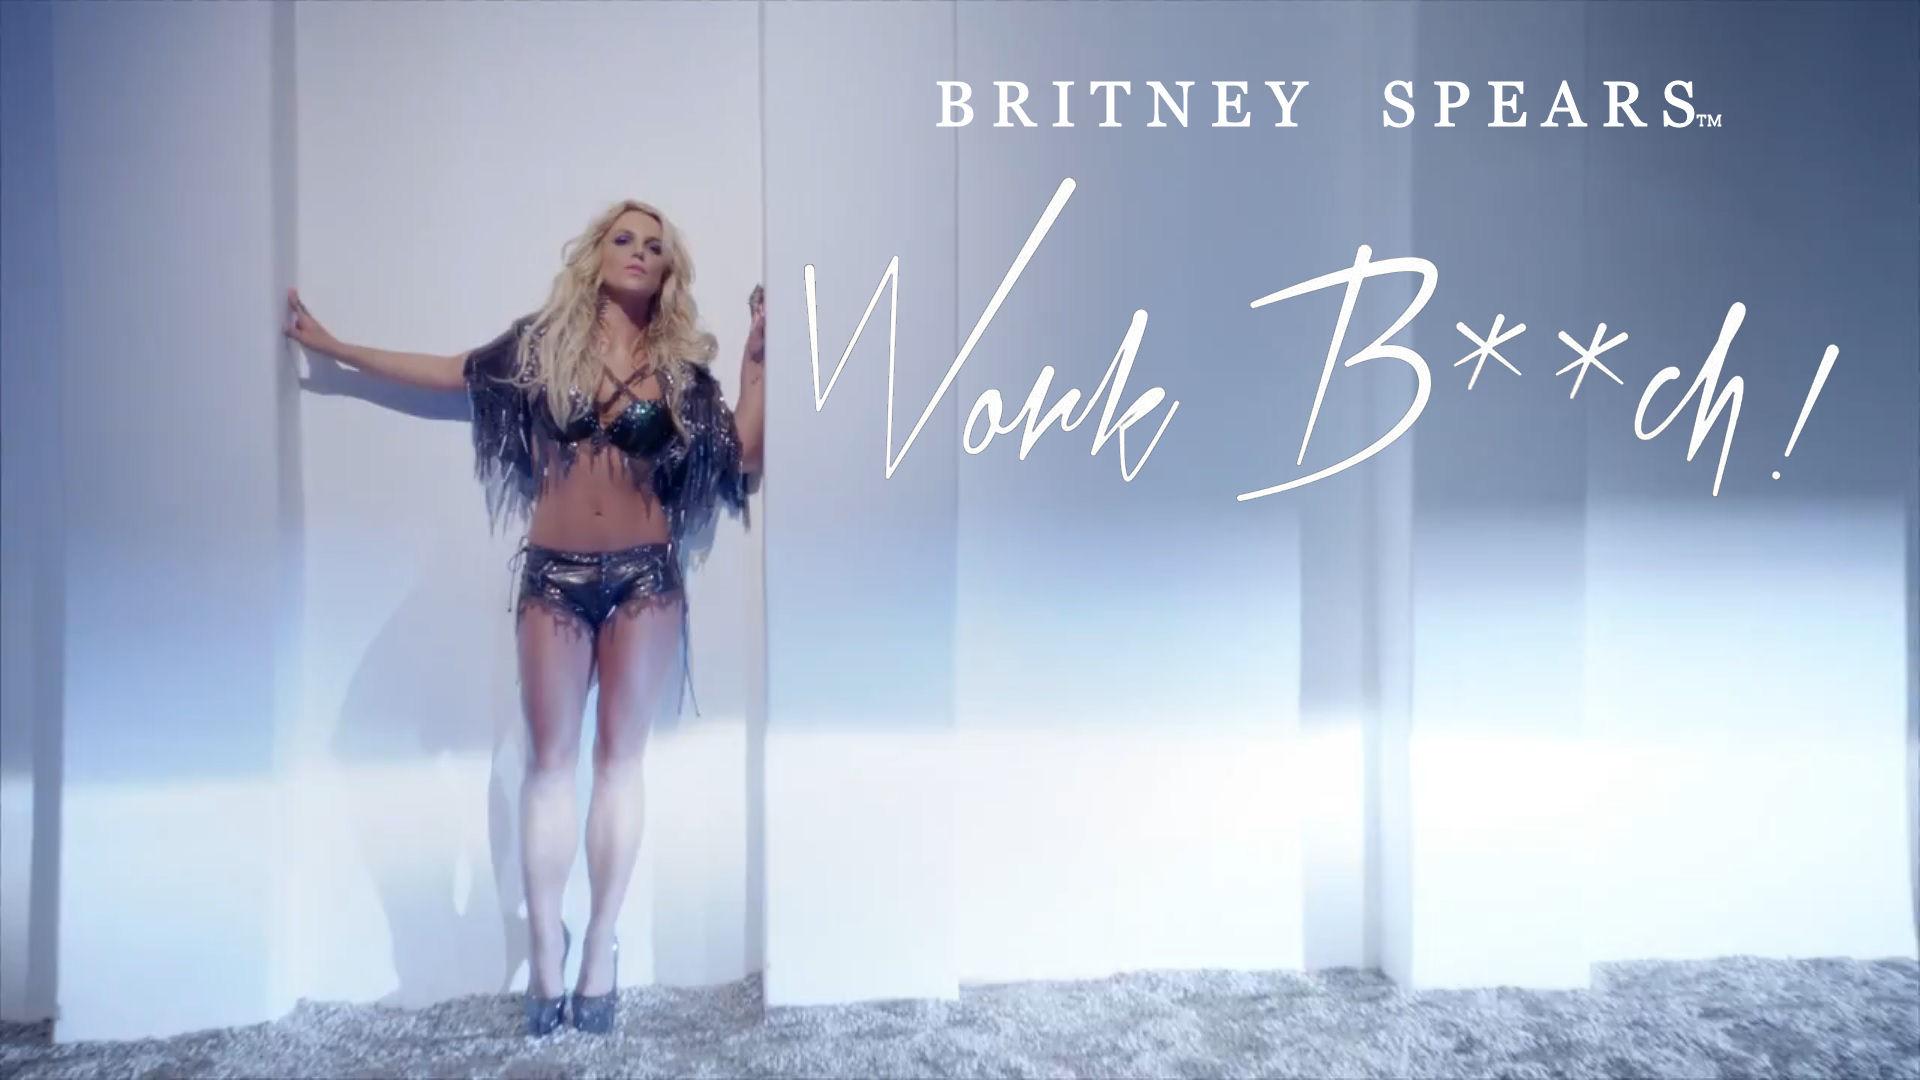 Britney spears work bitch 5